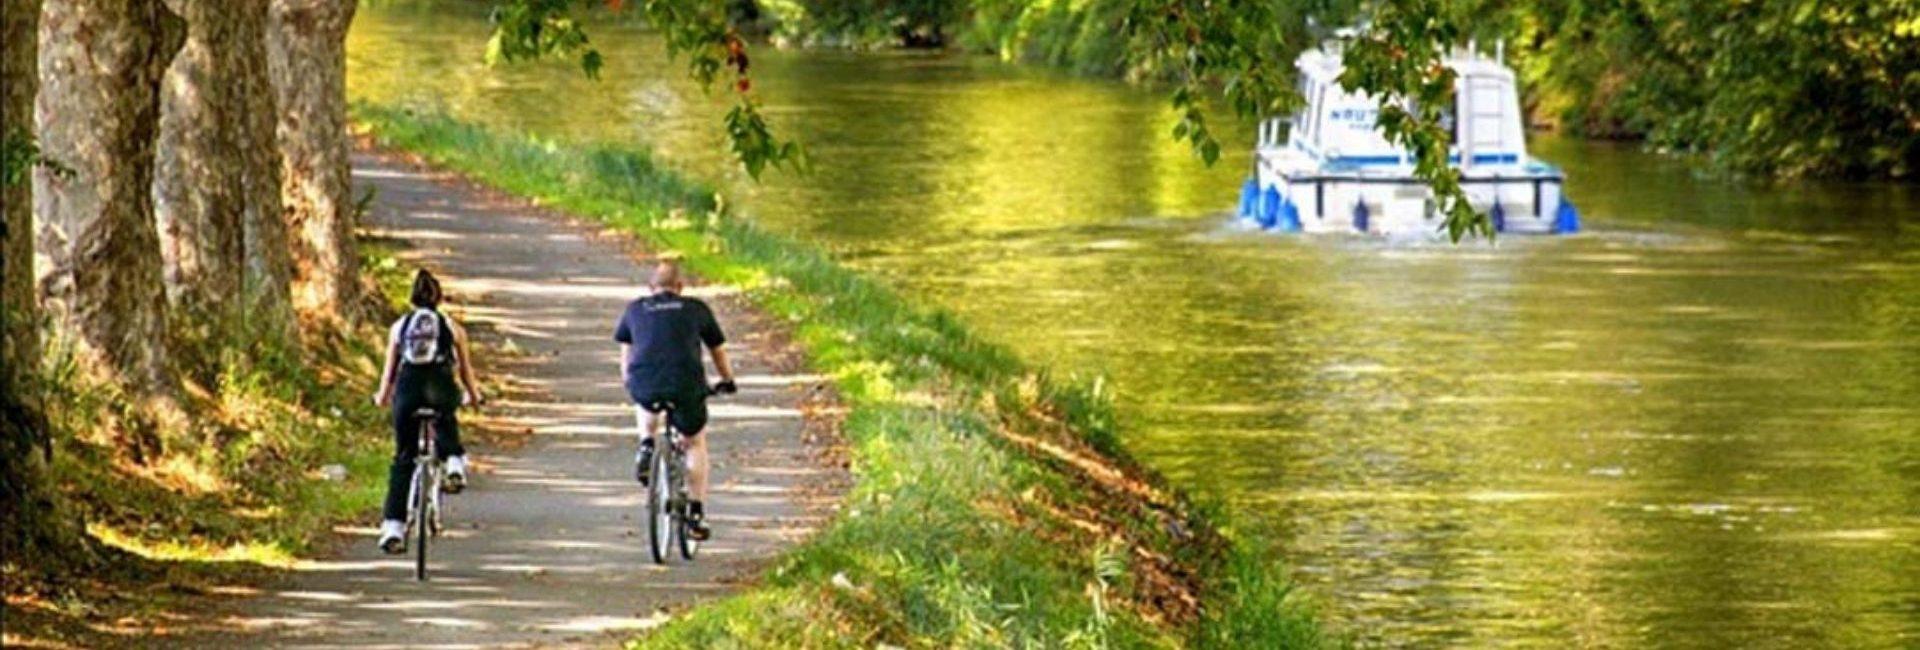 Camping L'air Marin : Balade à Vélo Le Long Du Canal Du Midi